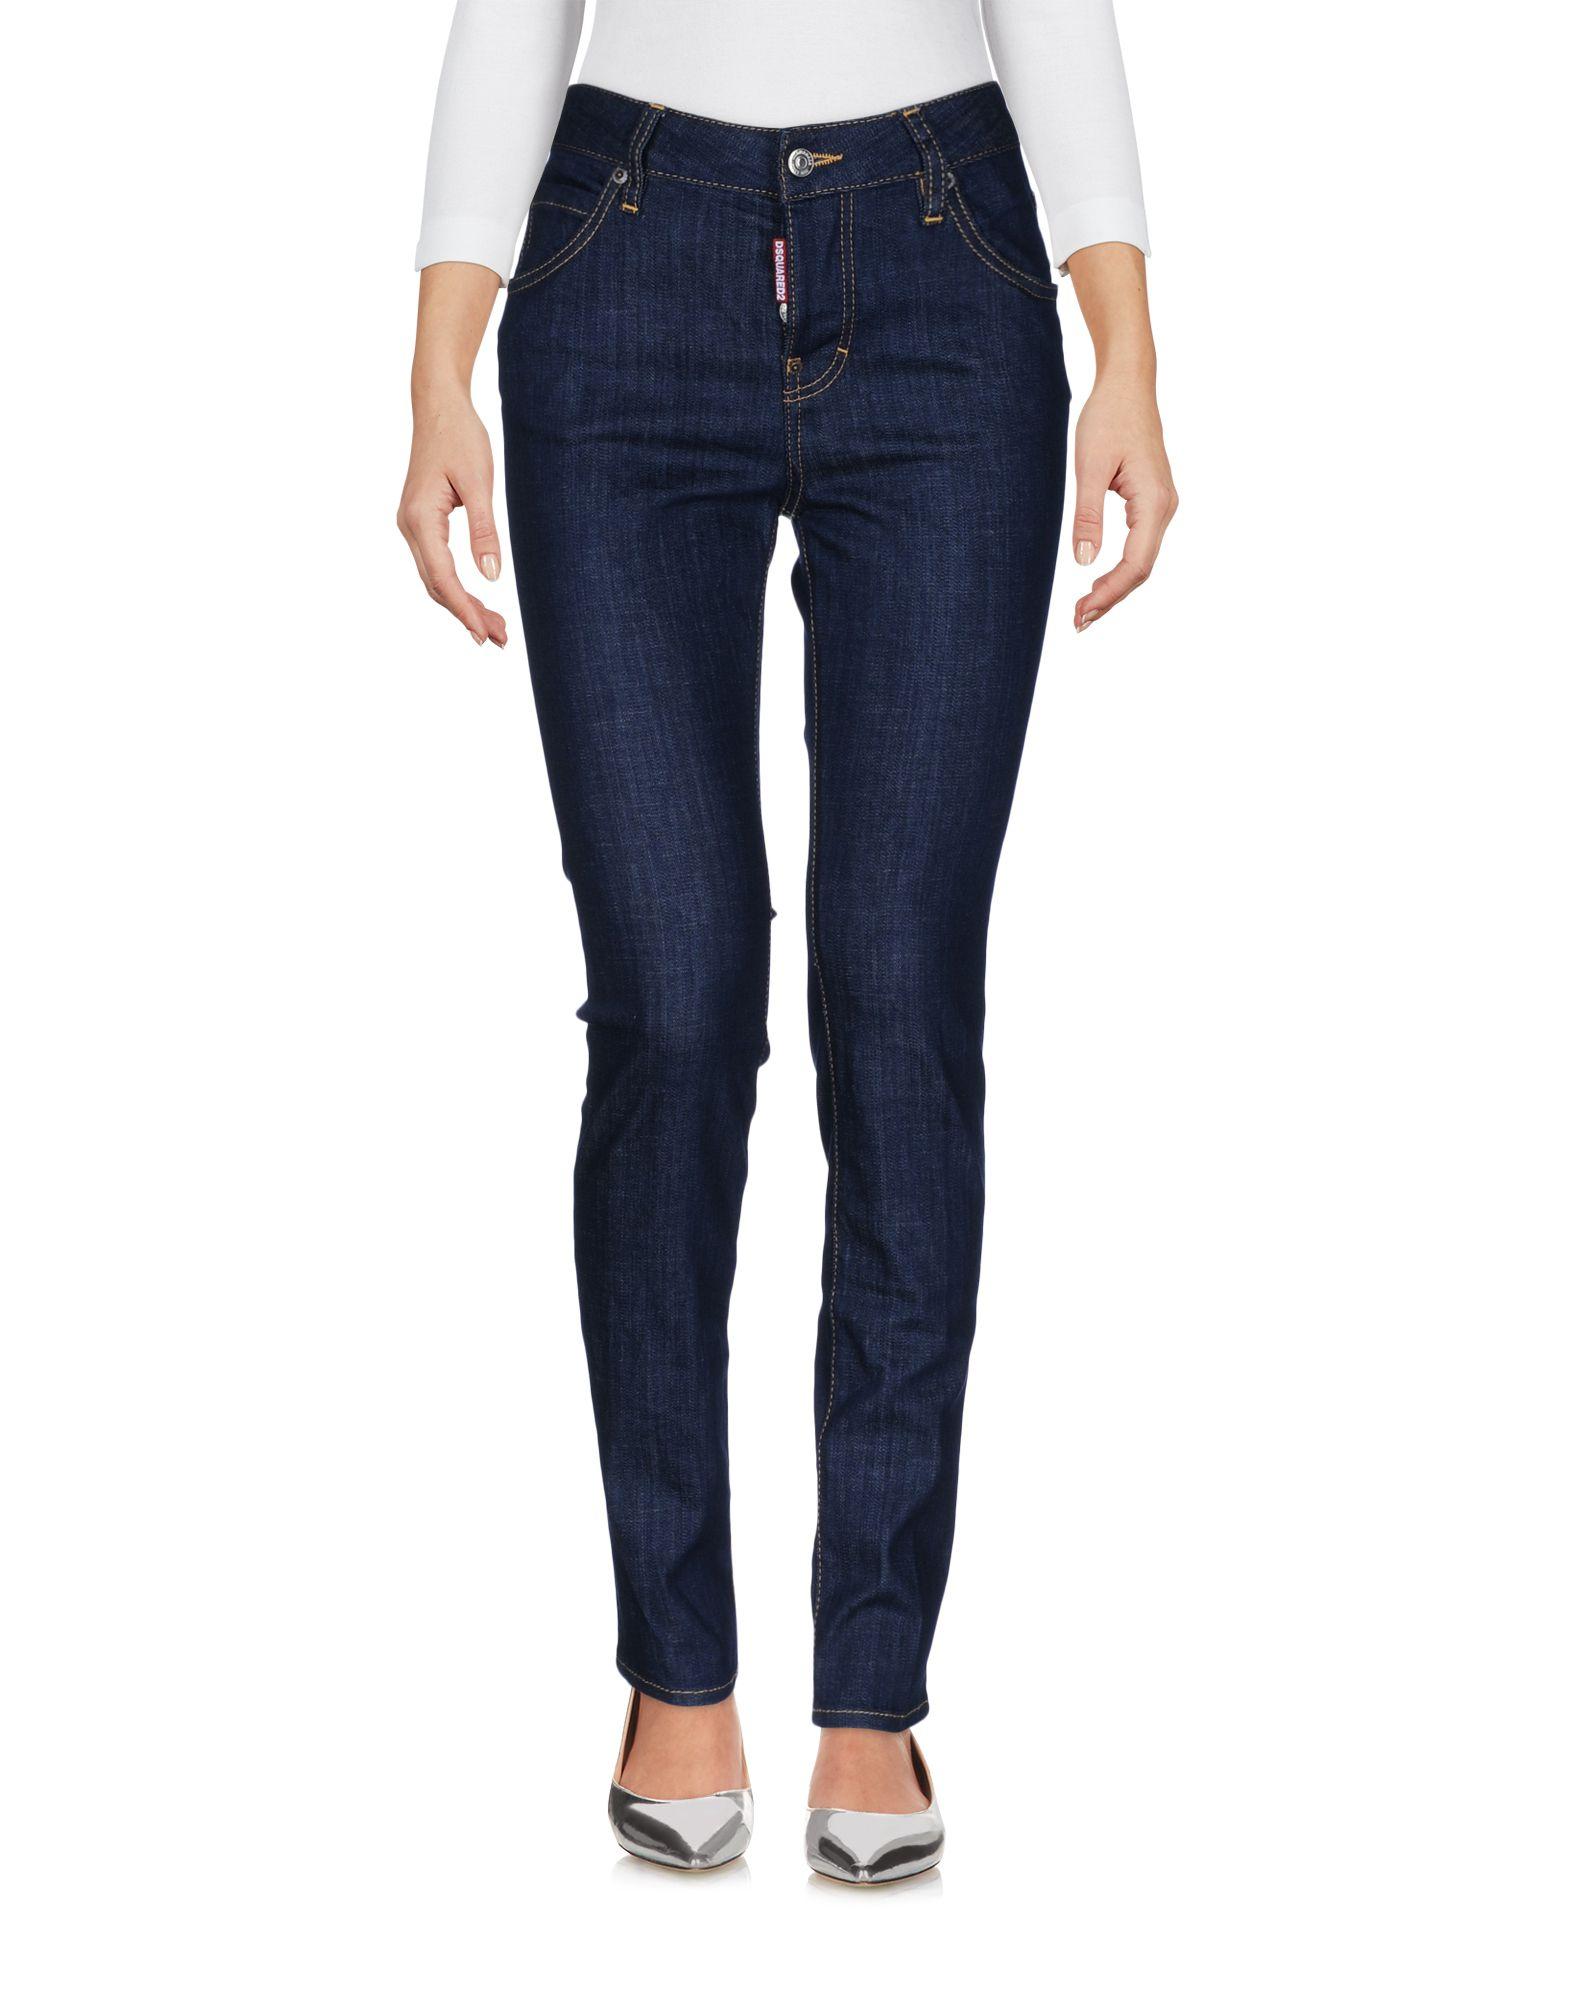 Pantaloni Jeans Dsquared2 Donna - Acquista online su x1y7Qo